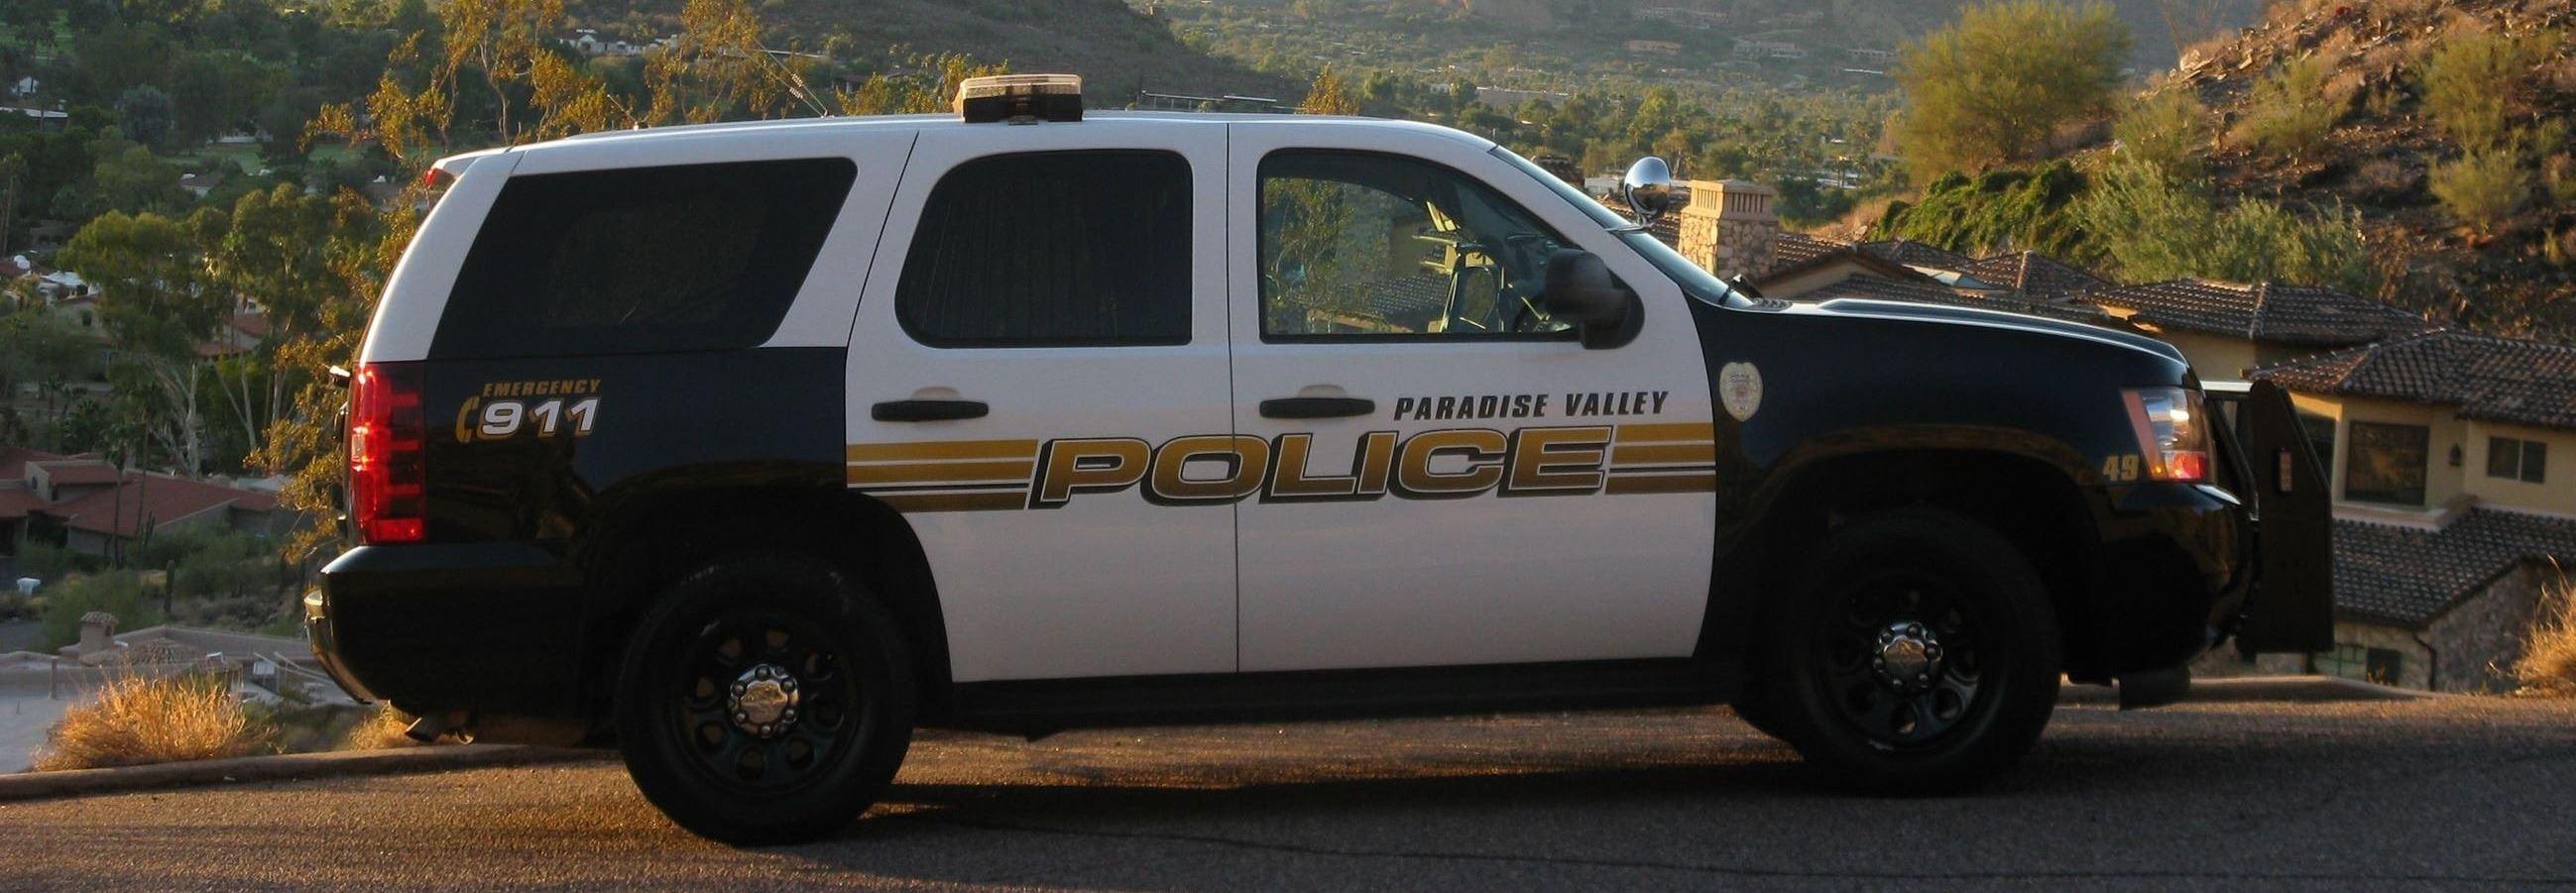 Police | Paradise Valley, AZ - Official Website